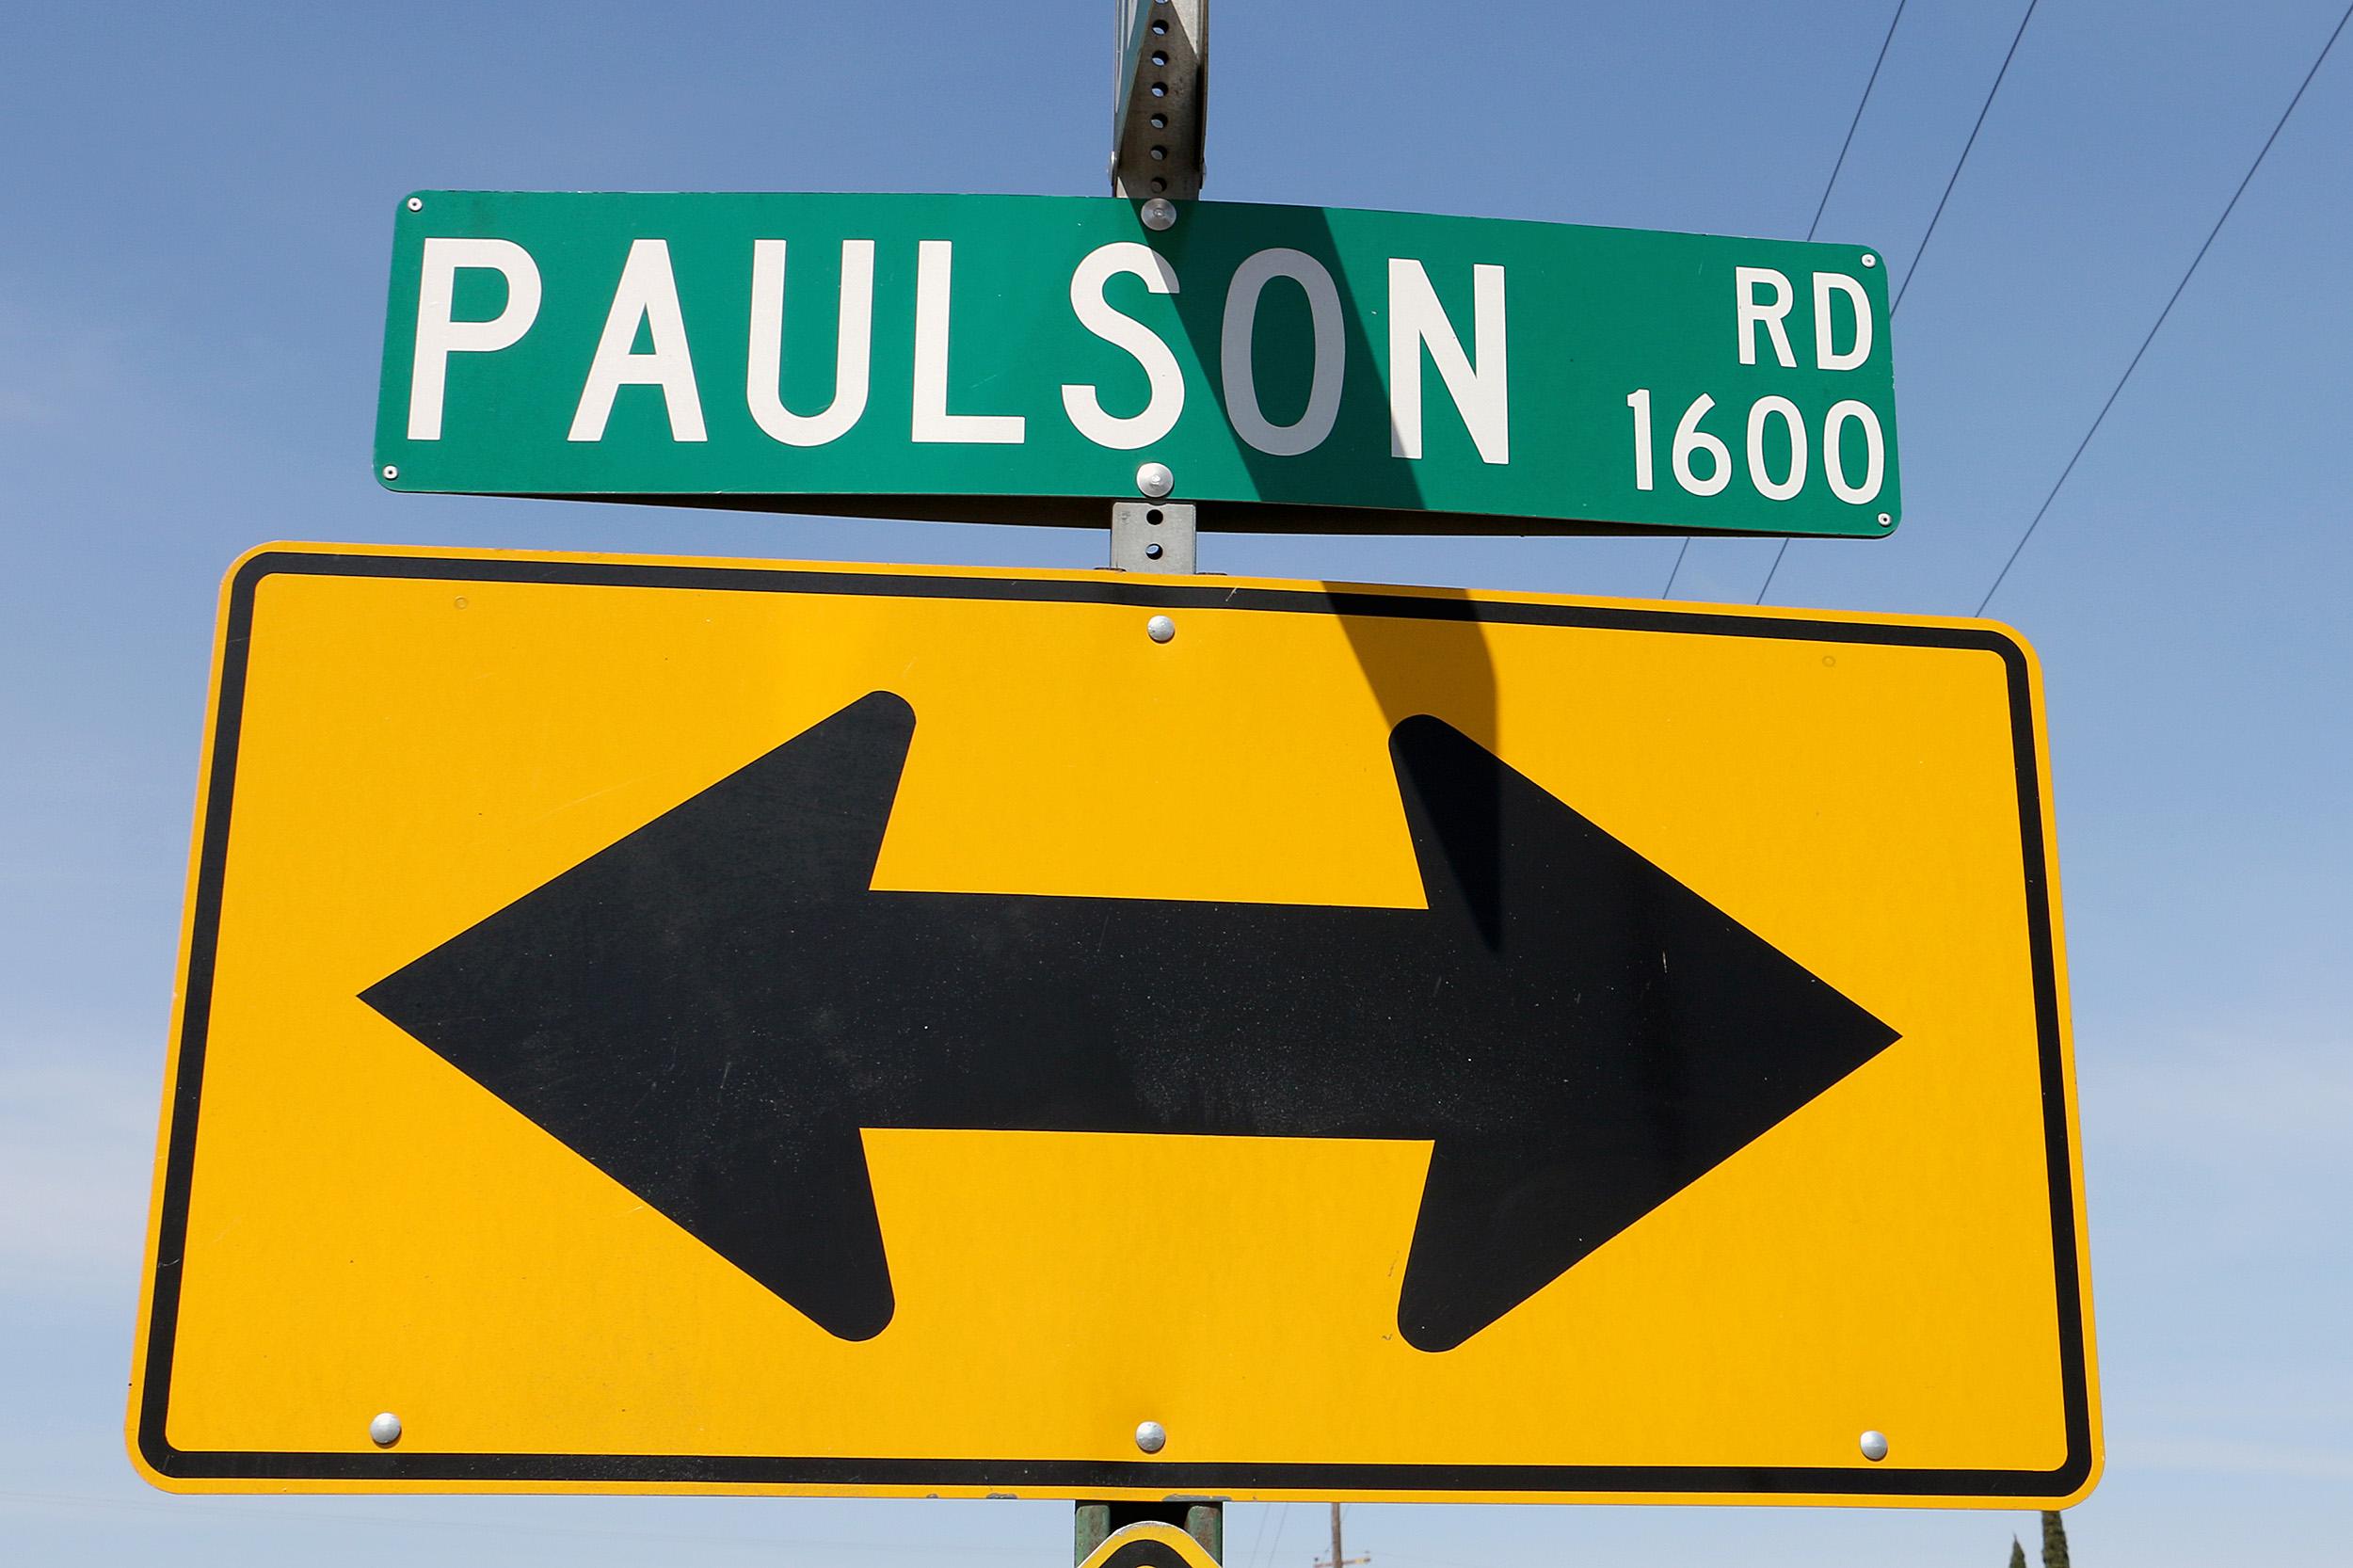 paulson road turlock